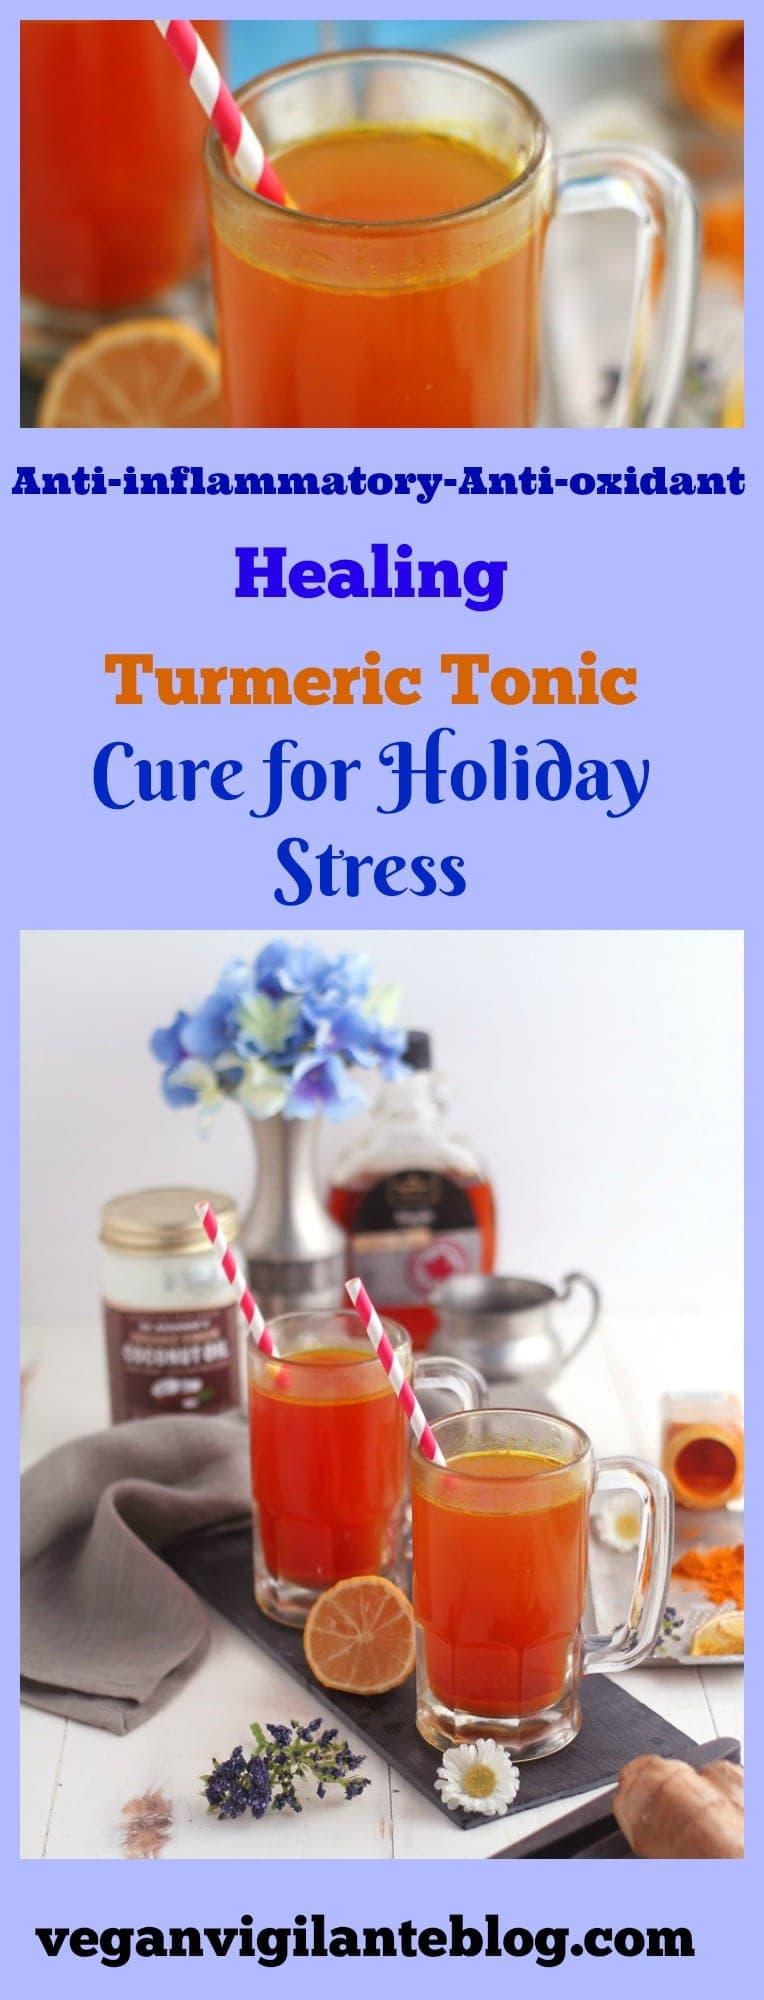 Turmeric Tonic